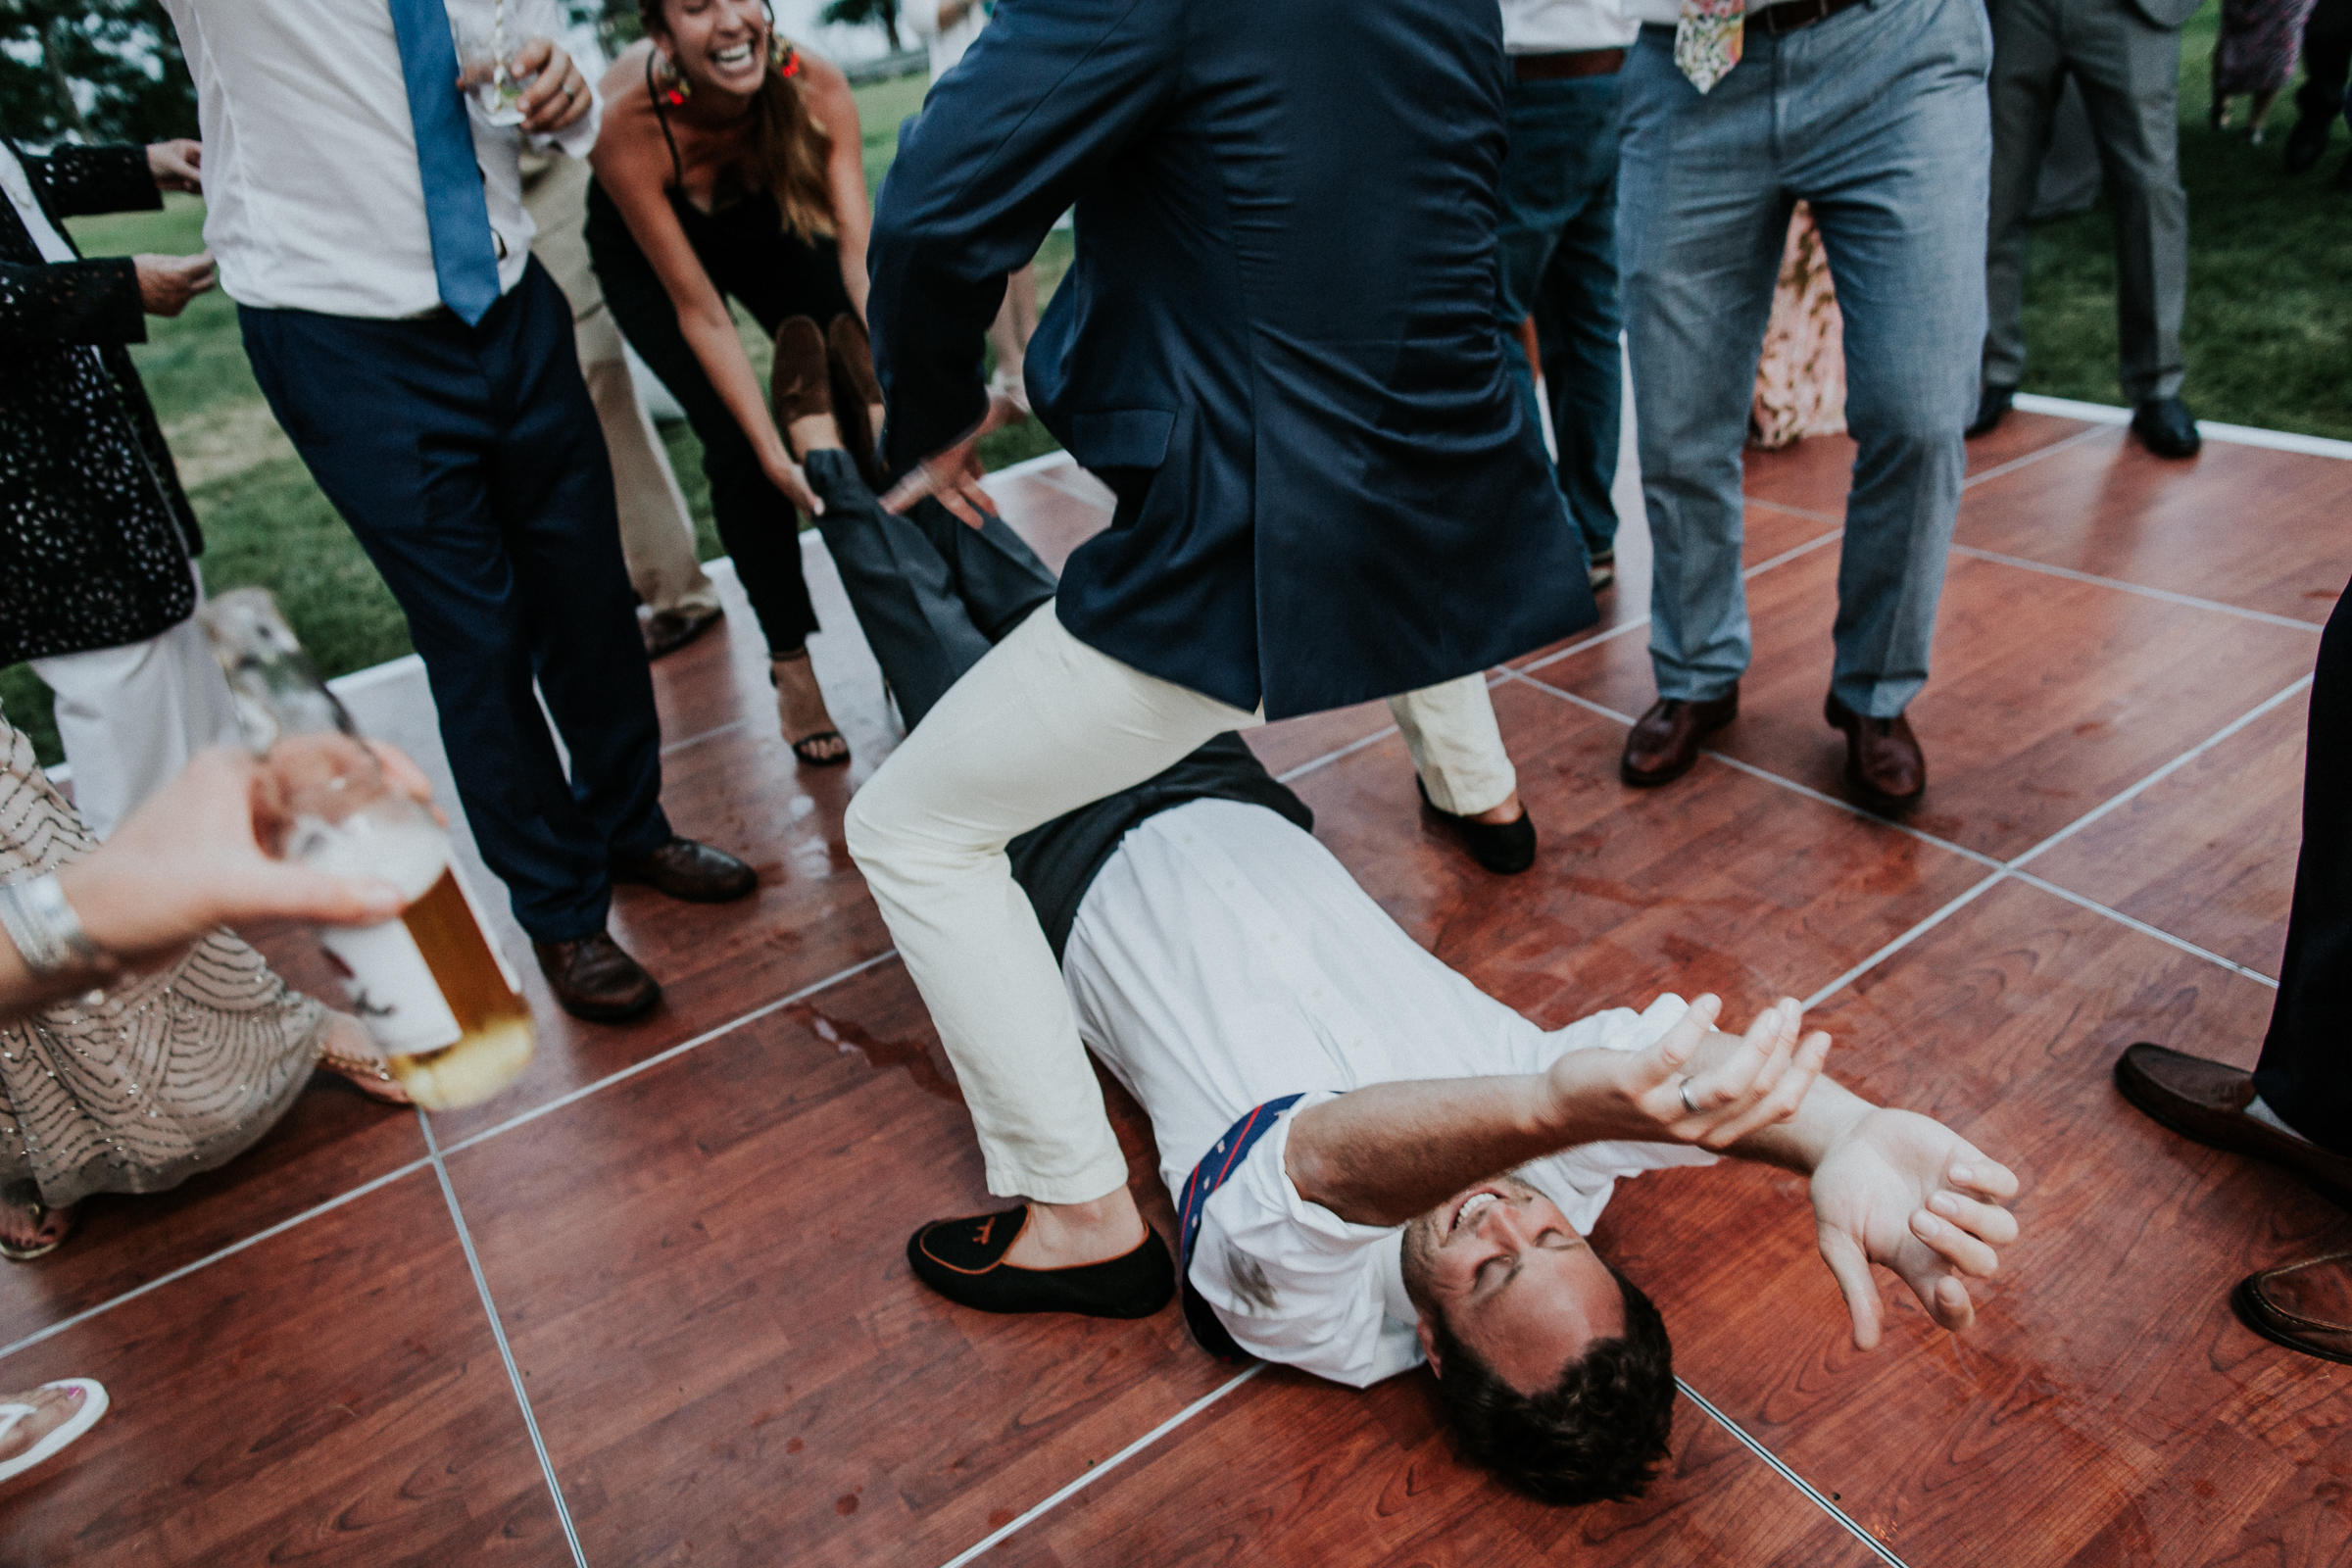 New-York-Documentary-Wedding-Photography-Best-Of-2017-by-Elvira-Kalviste-Photography-81.jpg